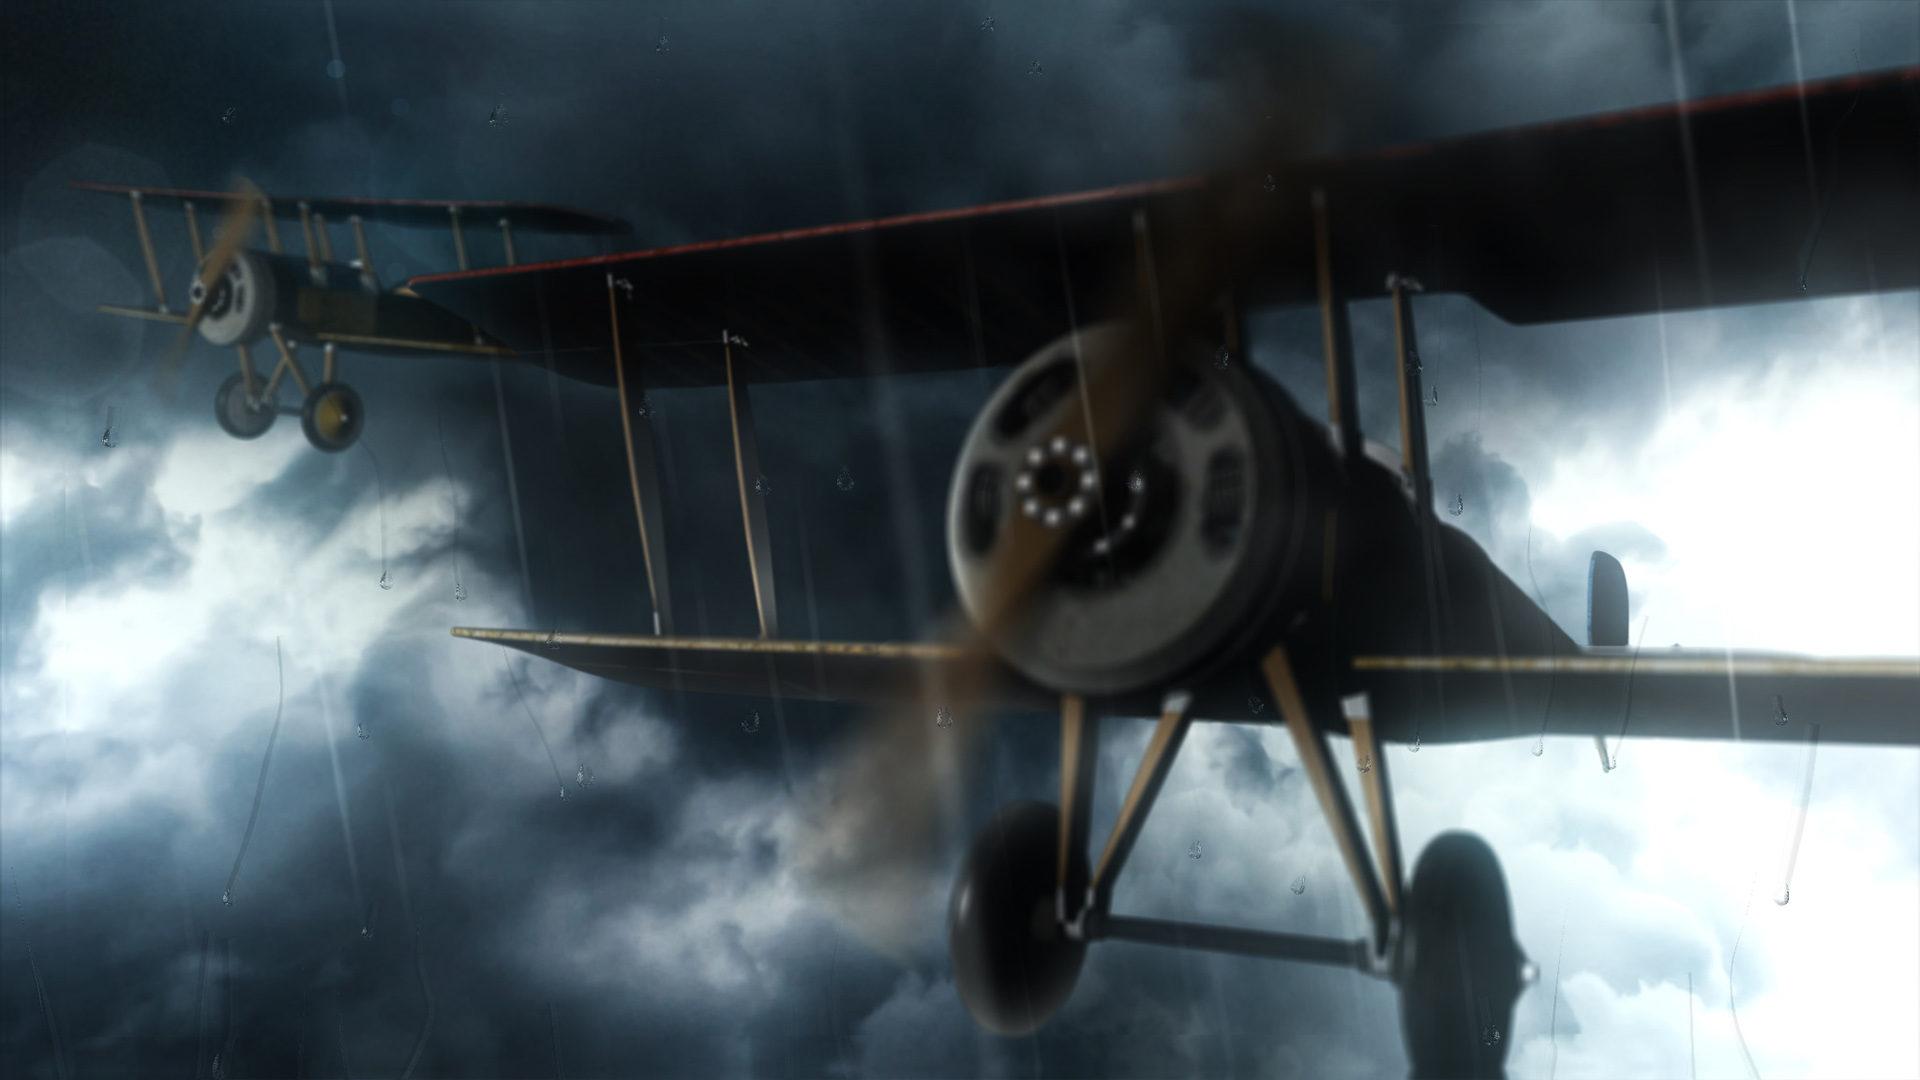 3D plane model VFX in storm - Talking HitFilm with Javert Valbarr